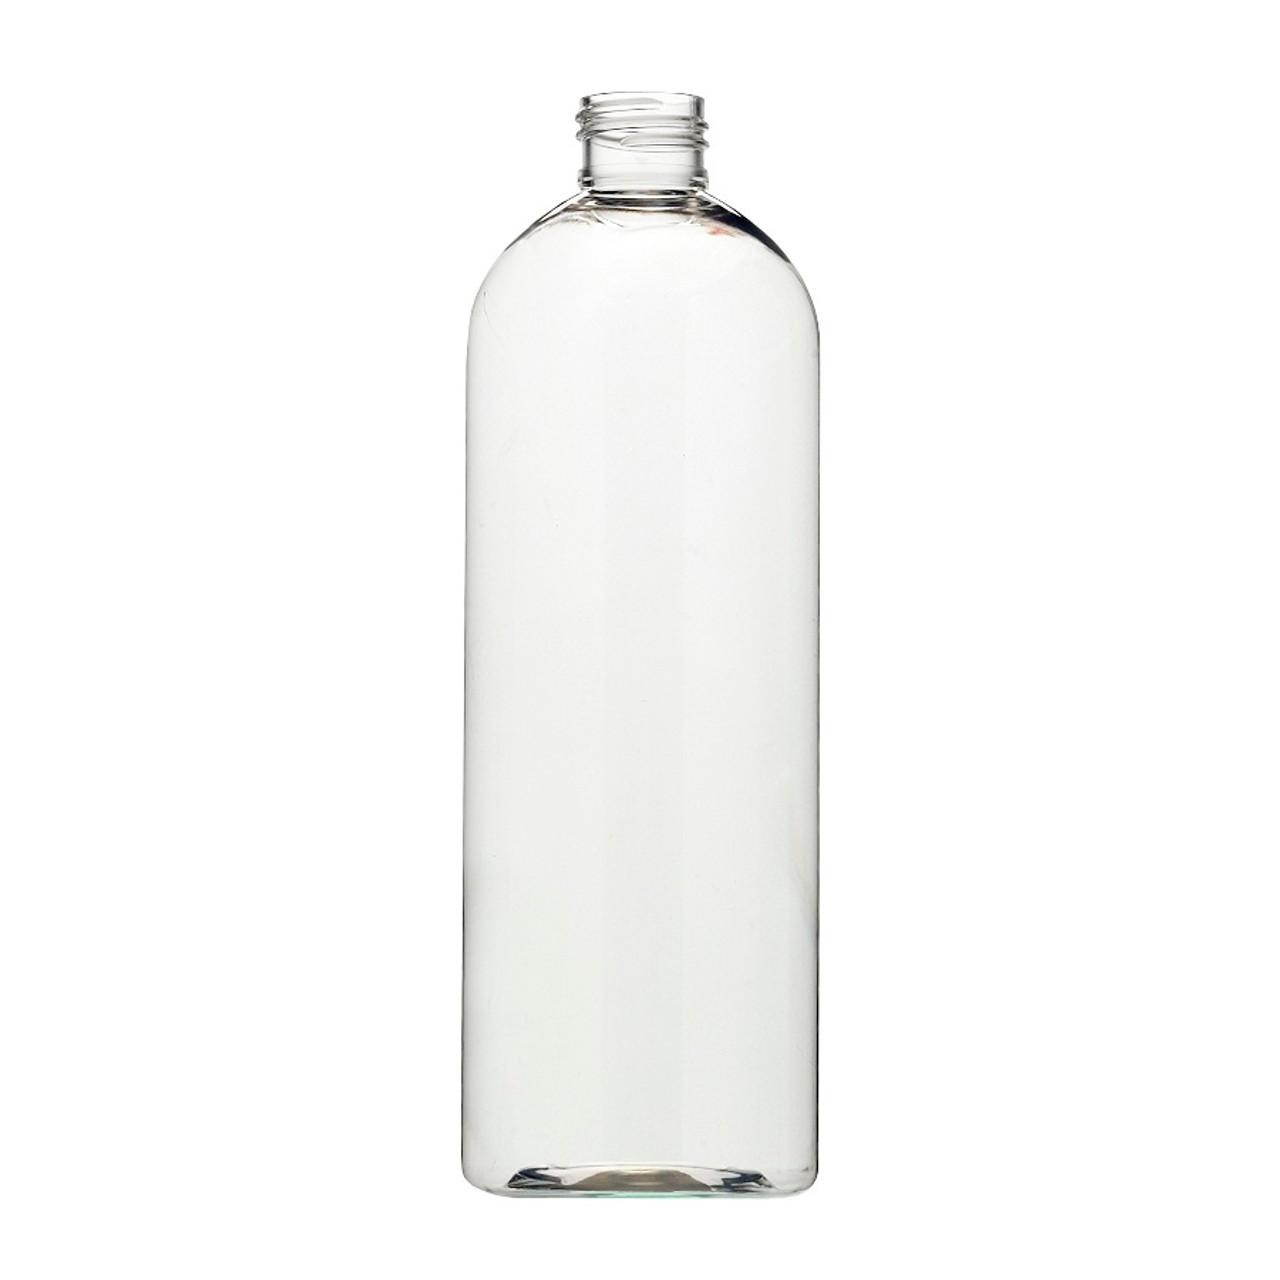 16 oz Clear PET Plastic Narrow Mouth Bullet Bottles   Berlin